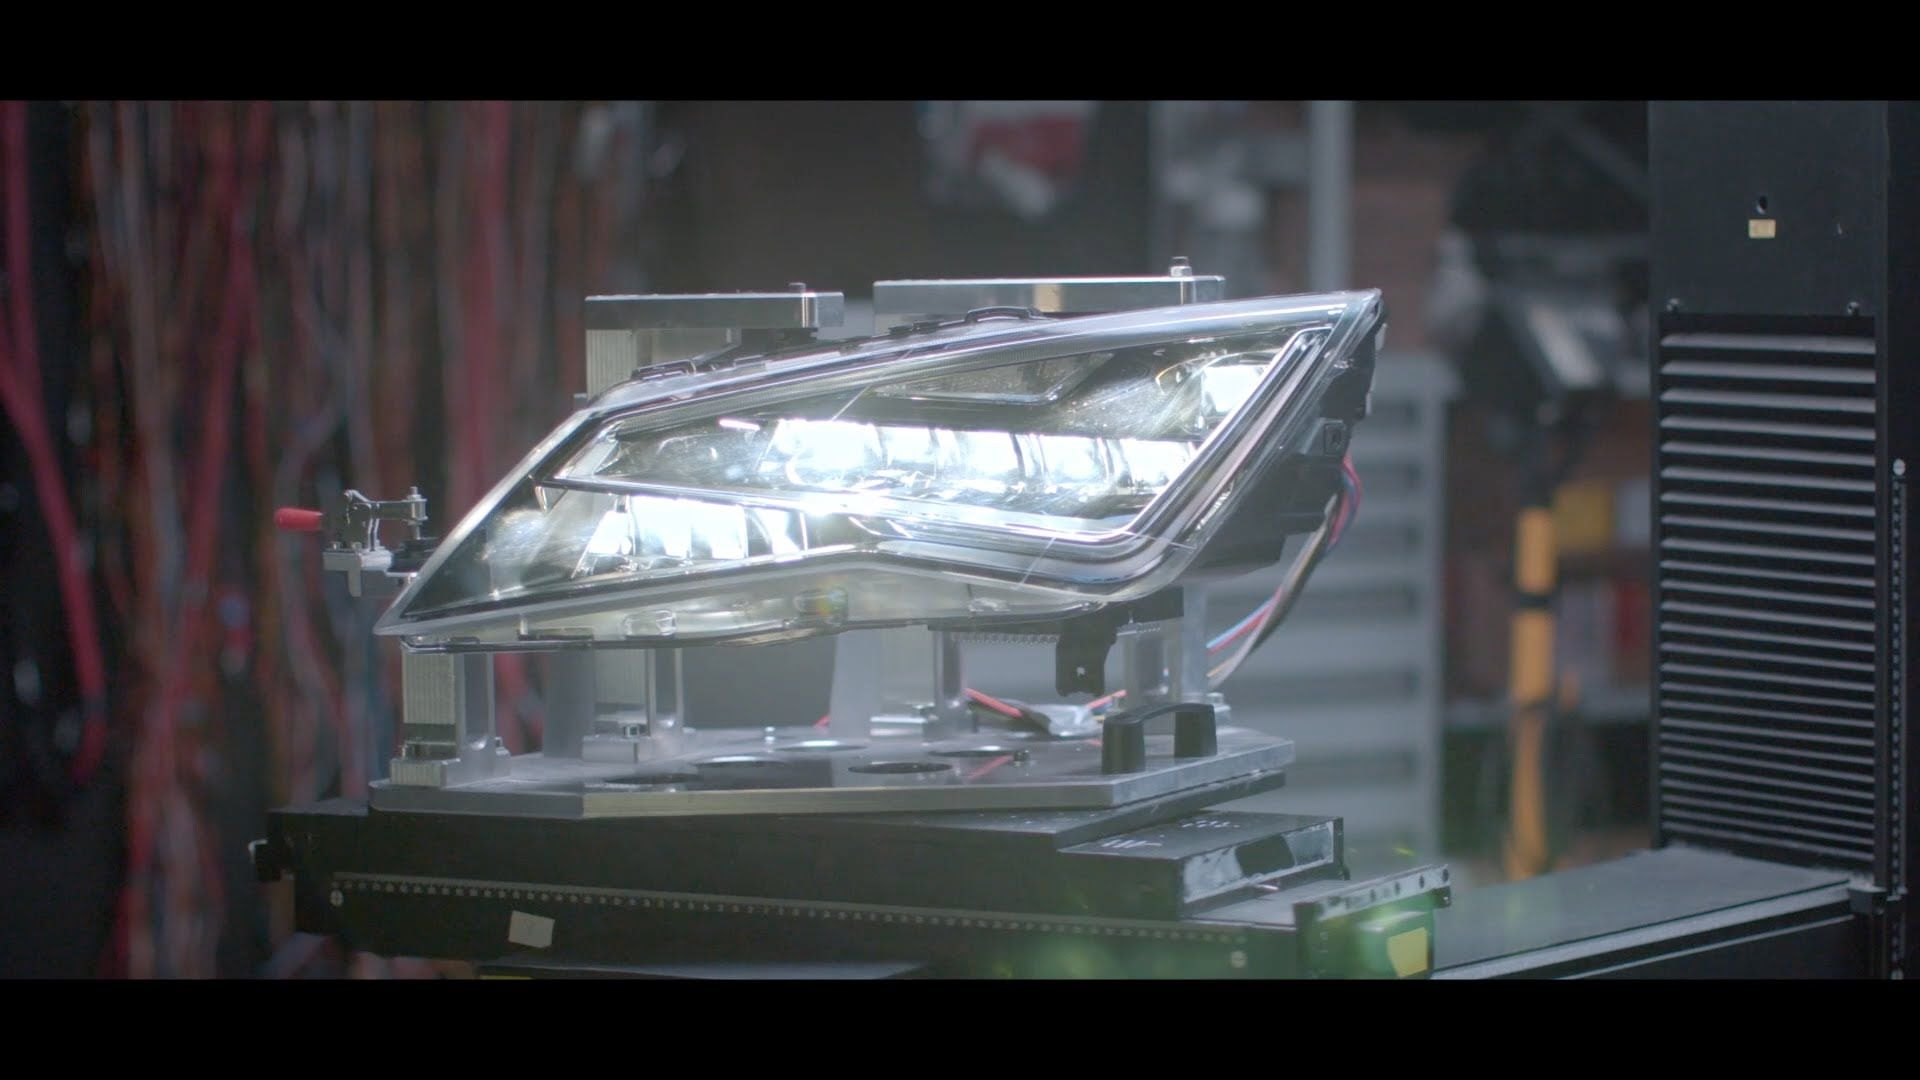 INSIDE SEAT – Voll-LED-Scheinwerfer